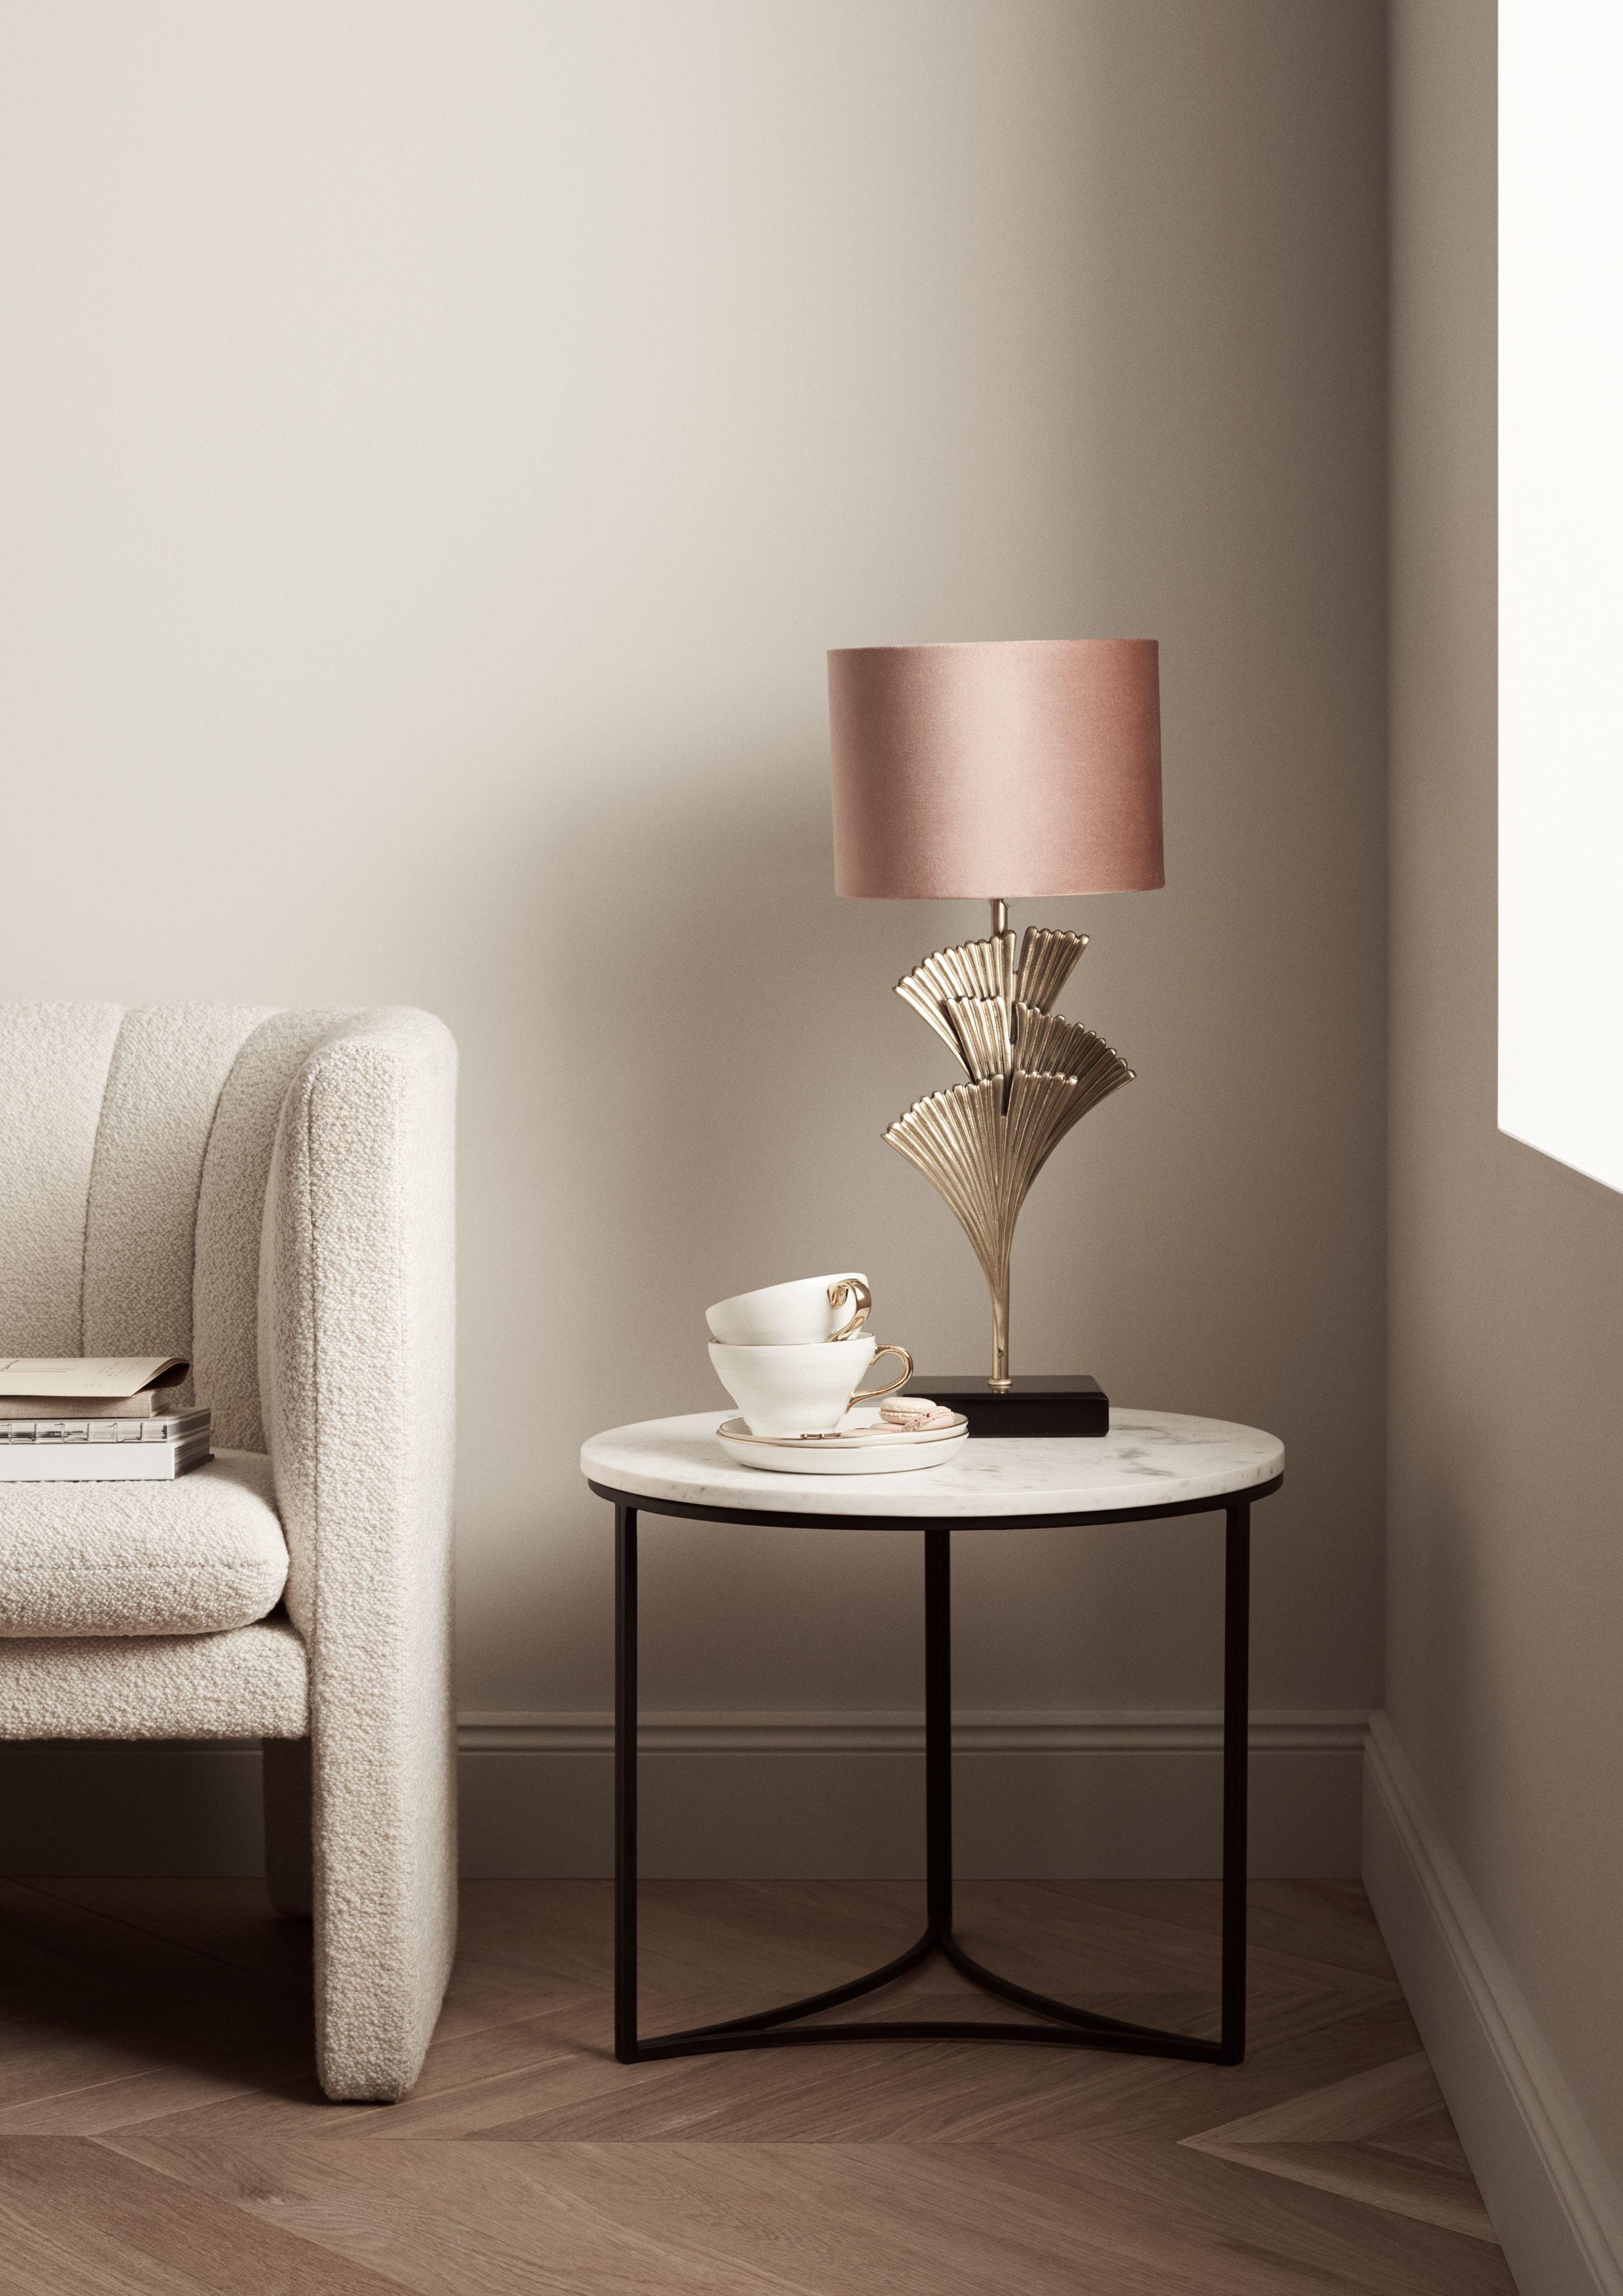 Incroyable Hu0026M Home Furniture Collection